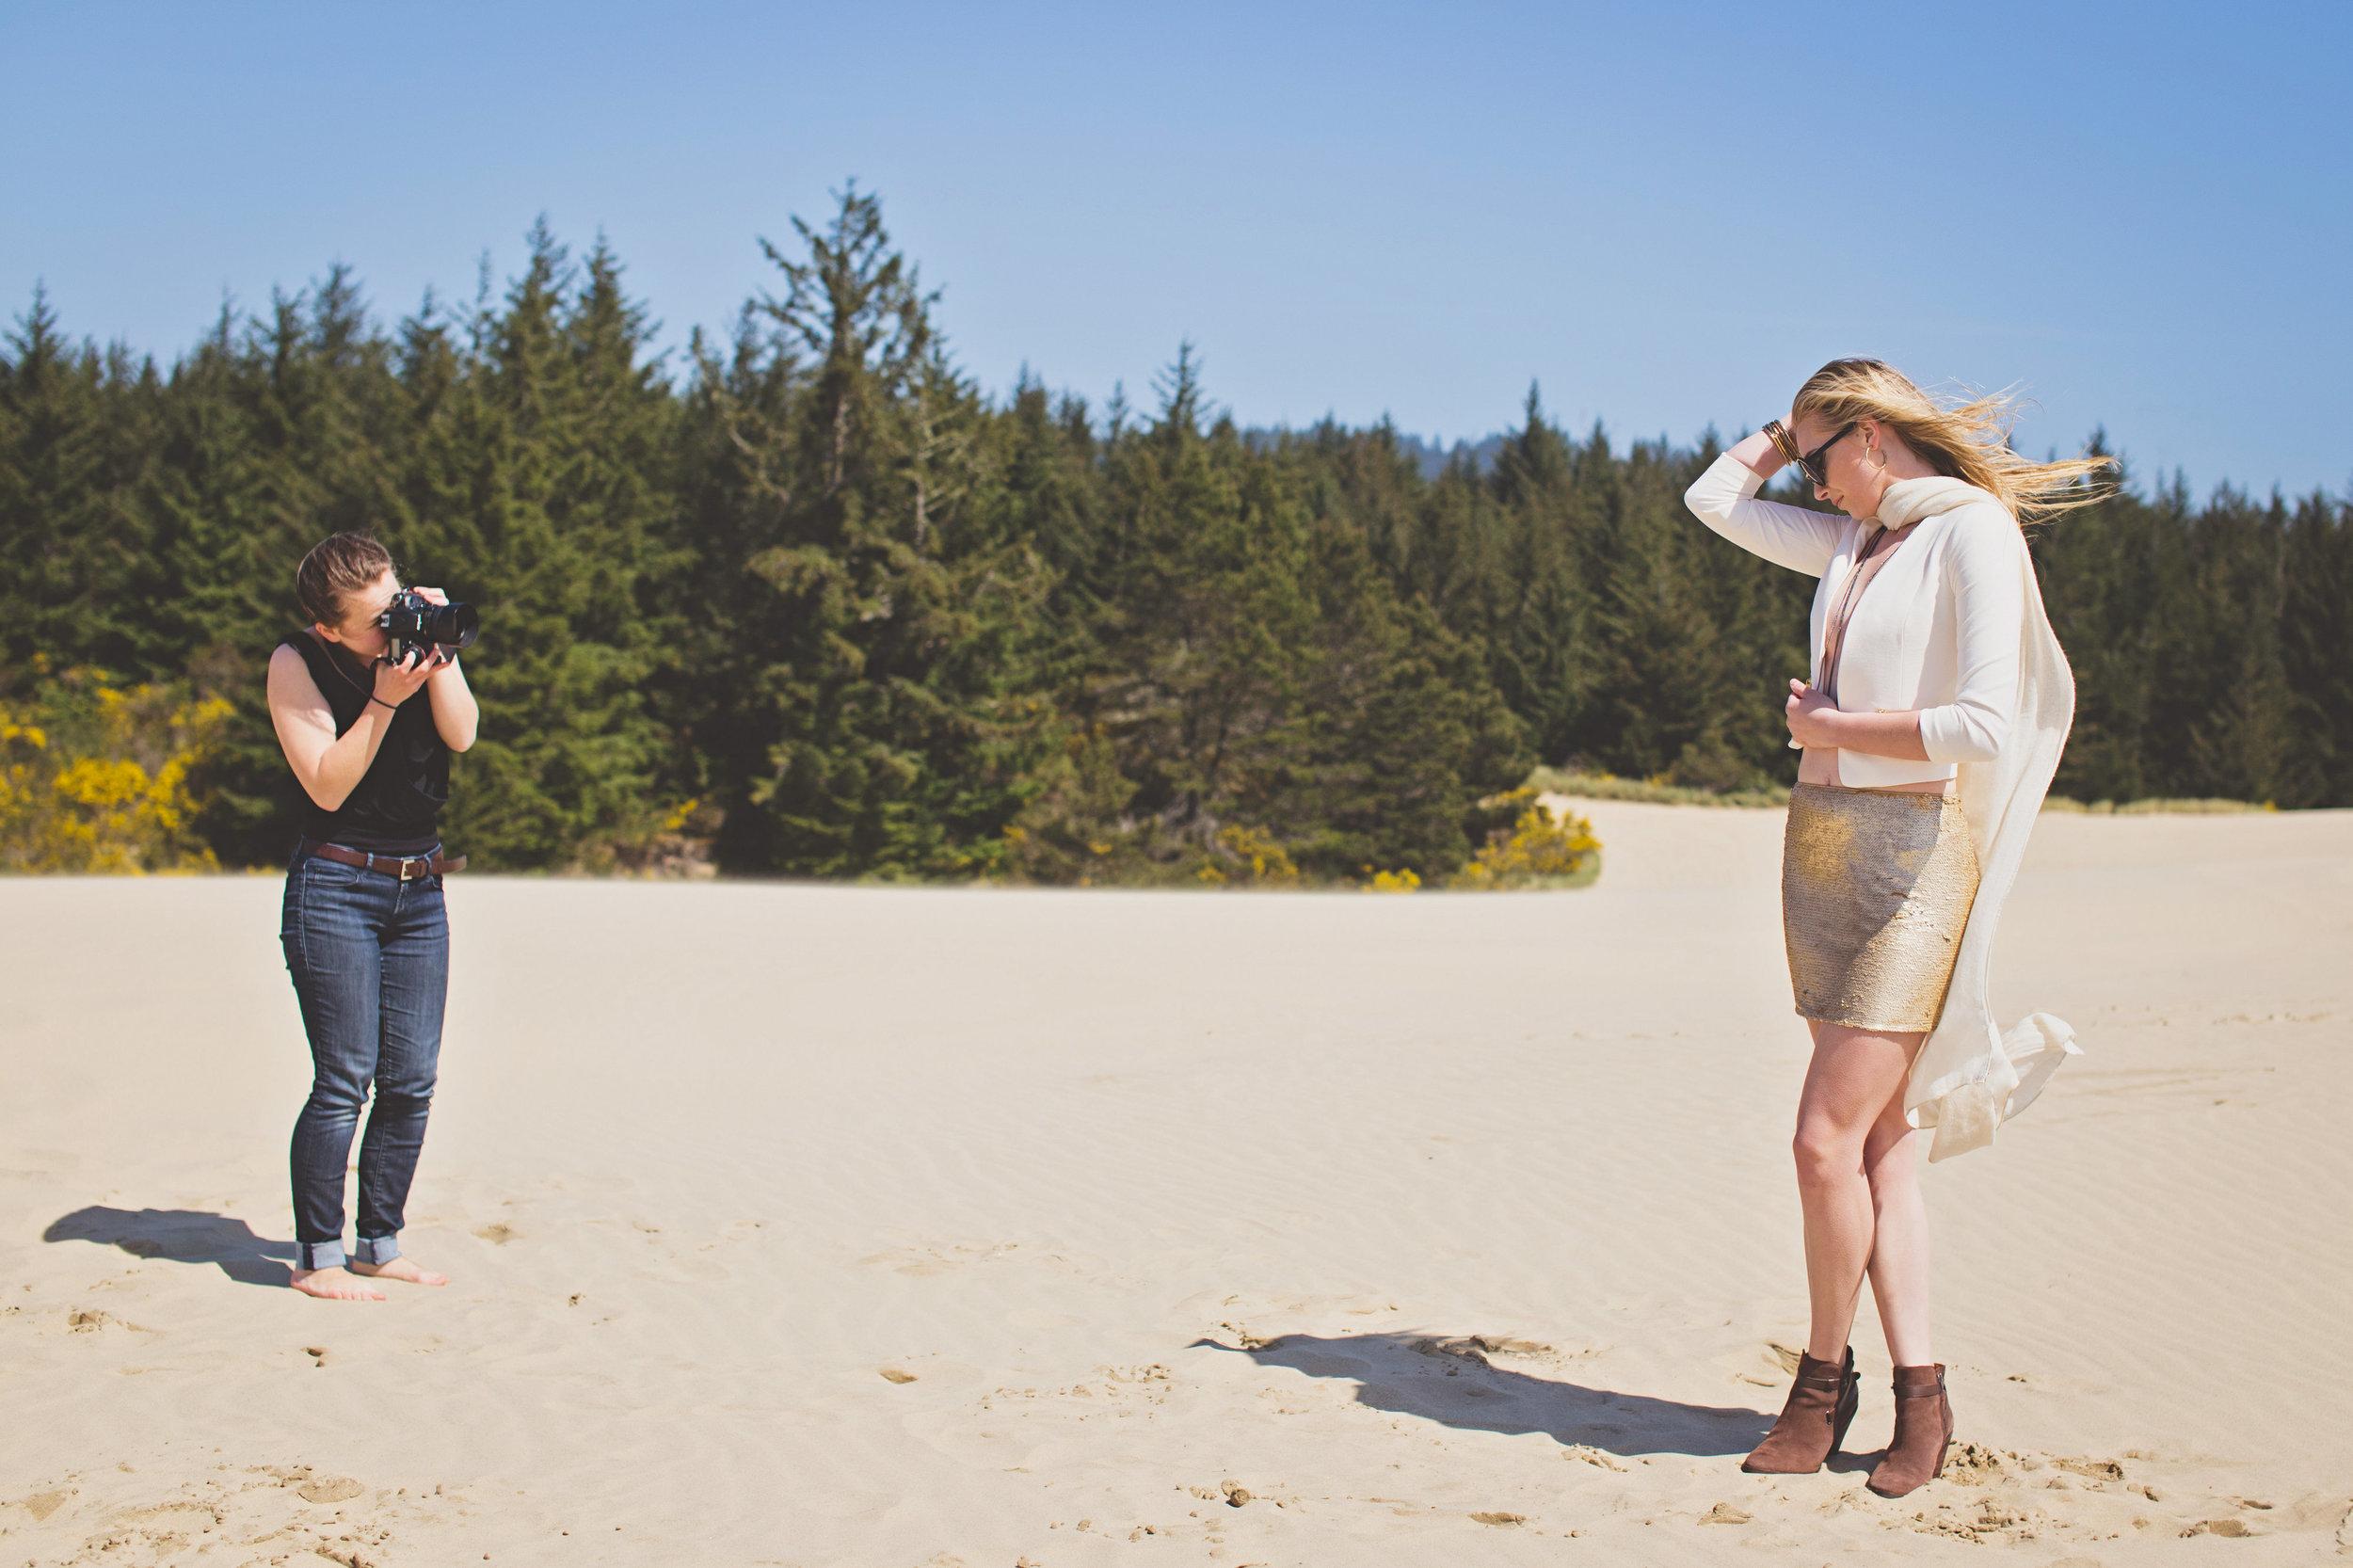 Alecia Lindsay with Nike Model Heather Dublanko at Florence Sand Dunes